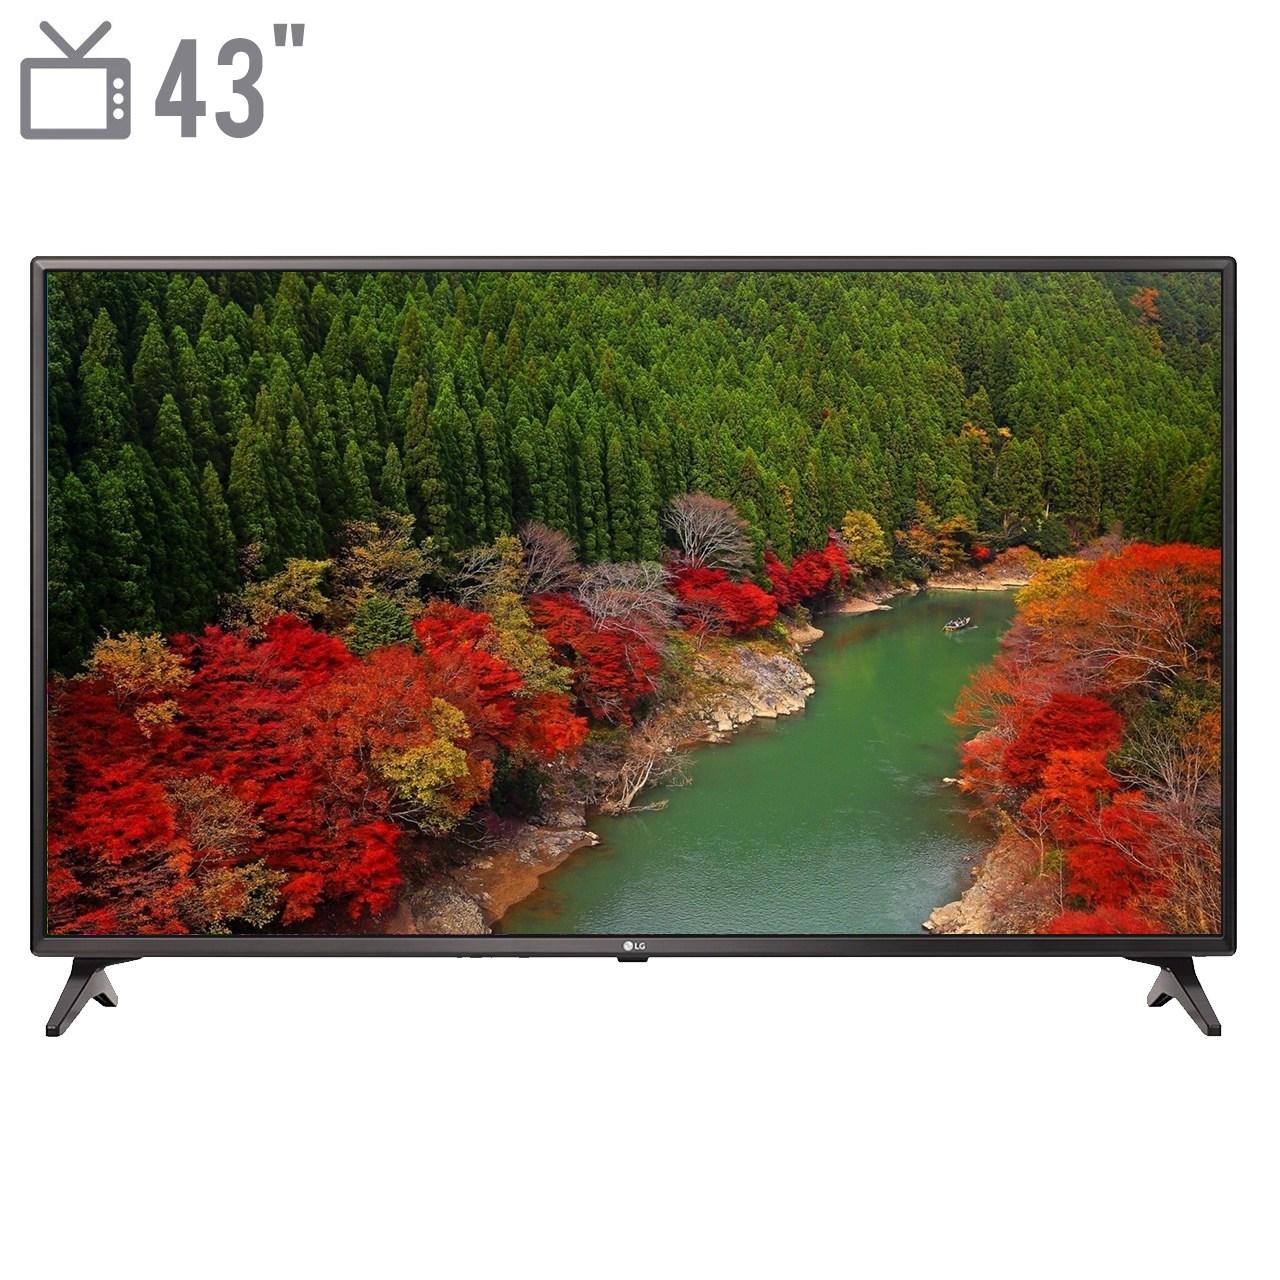 تلویزیون ال ای دی هوشمند ال جی مدل 43LJ62000GI سایز 43 اینچ | LG 43LJ62000GI Smart LED TV 43 Inch